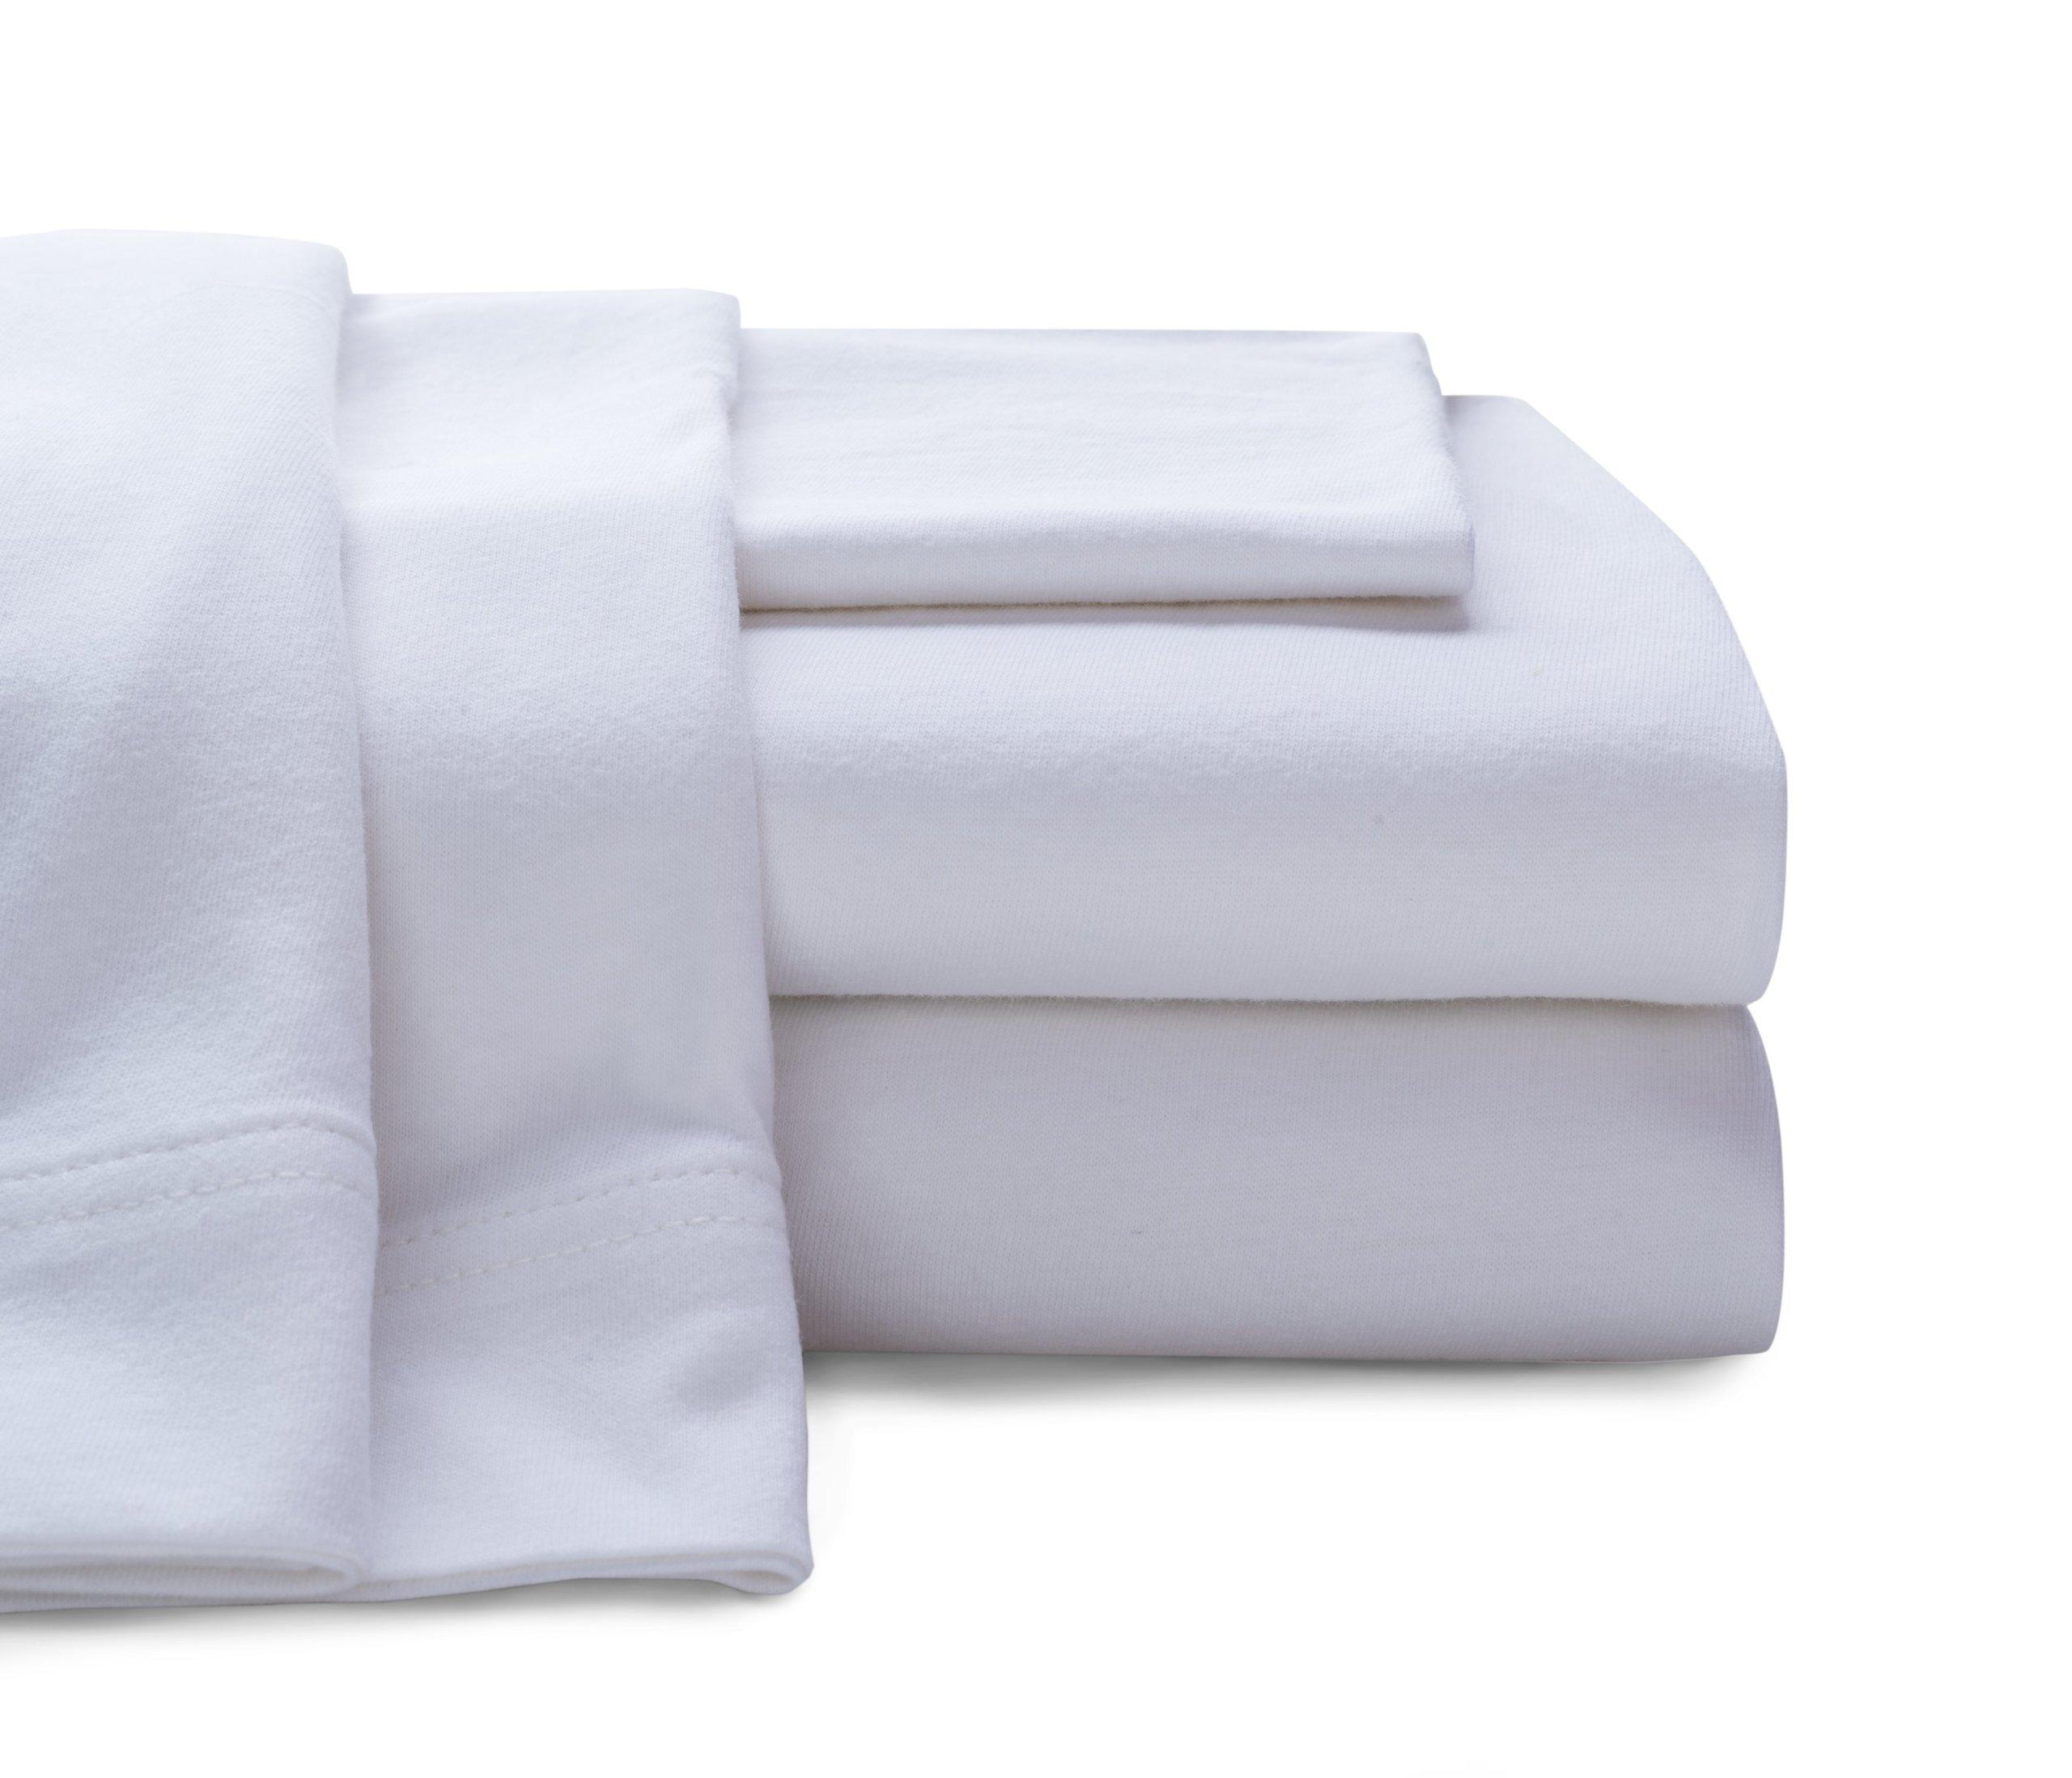 Baltic Linen Company Cotton Jersey Sheet Set, California King, White